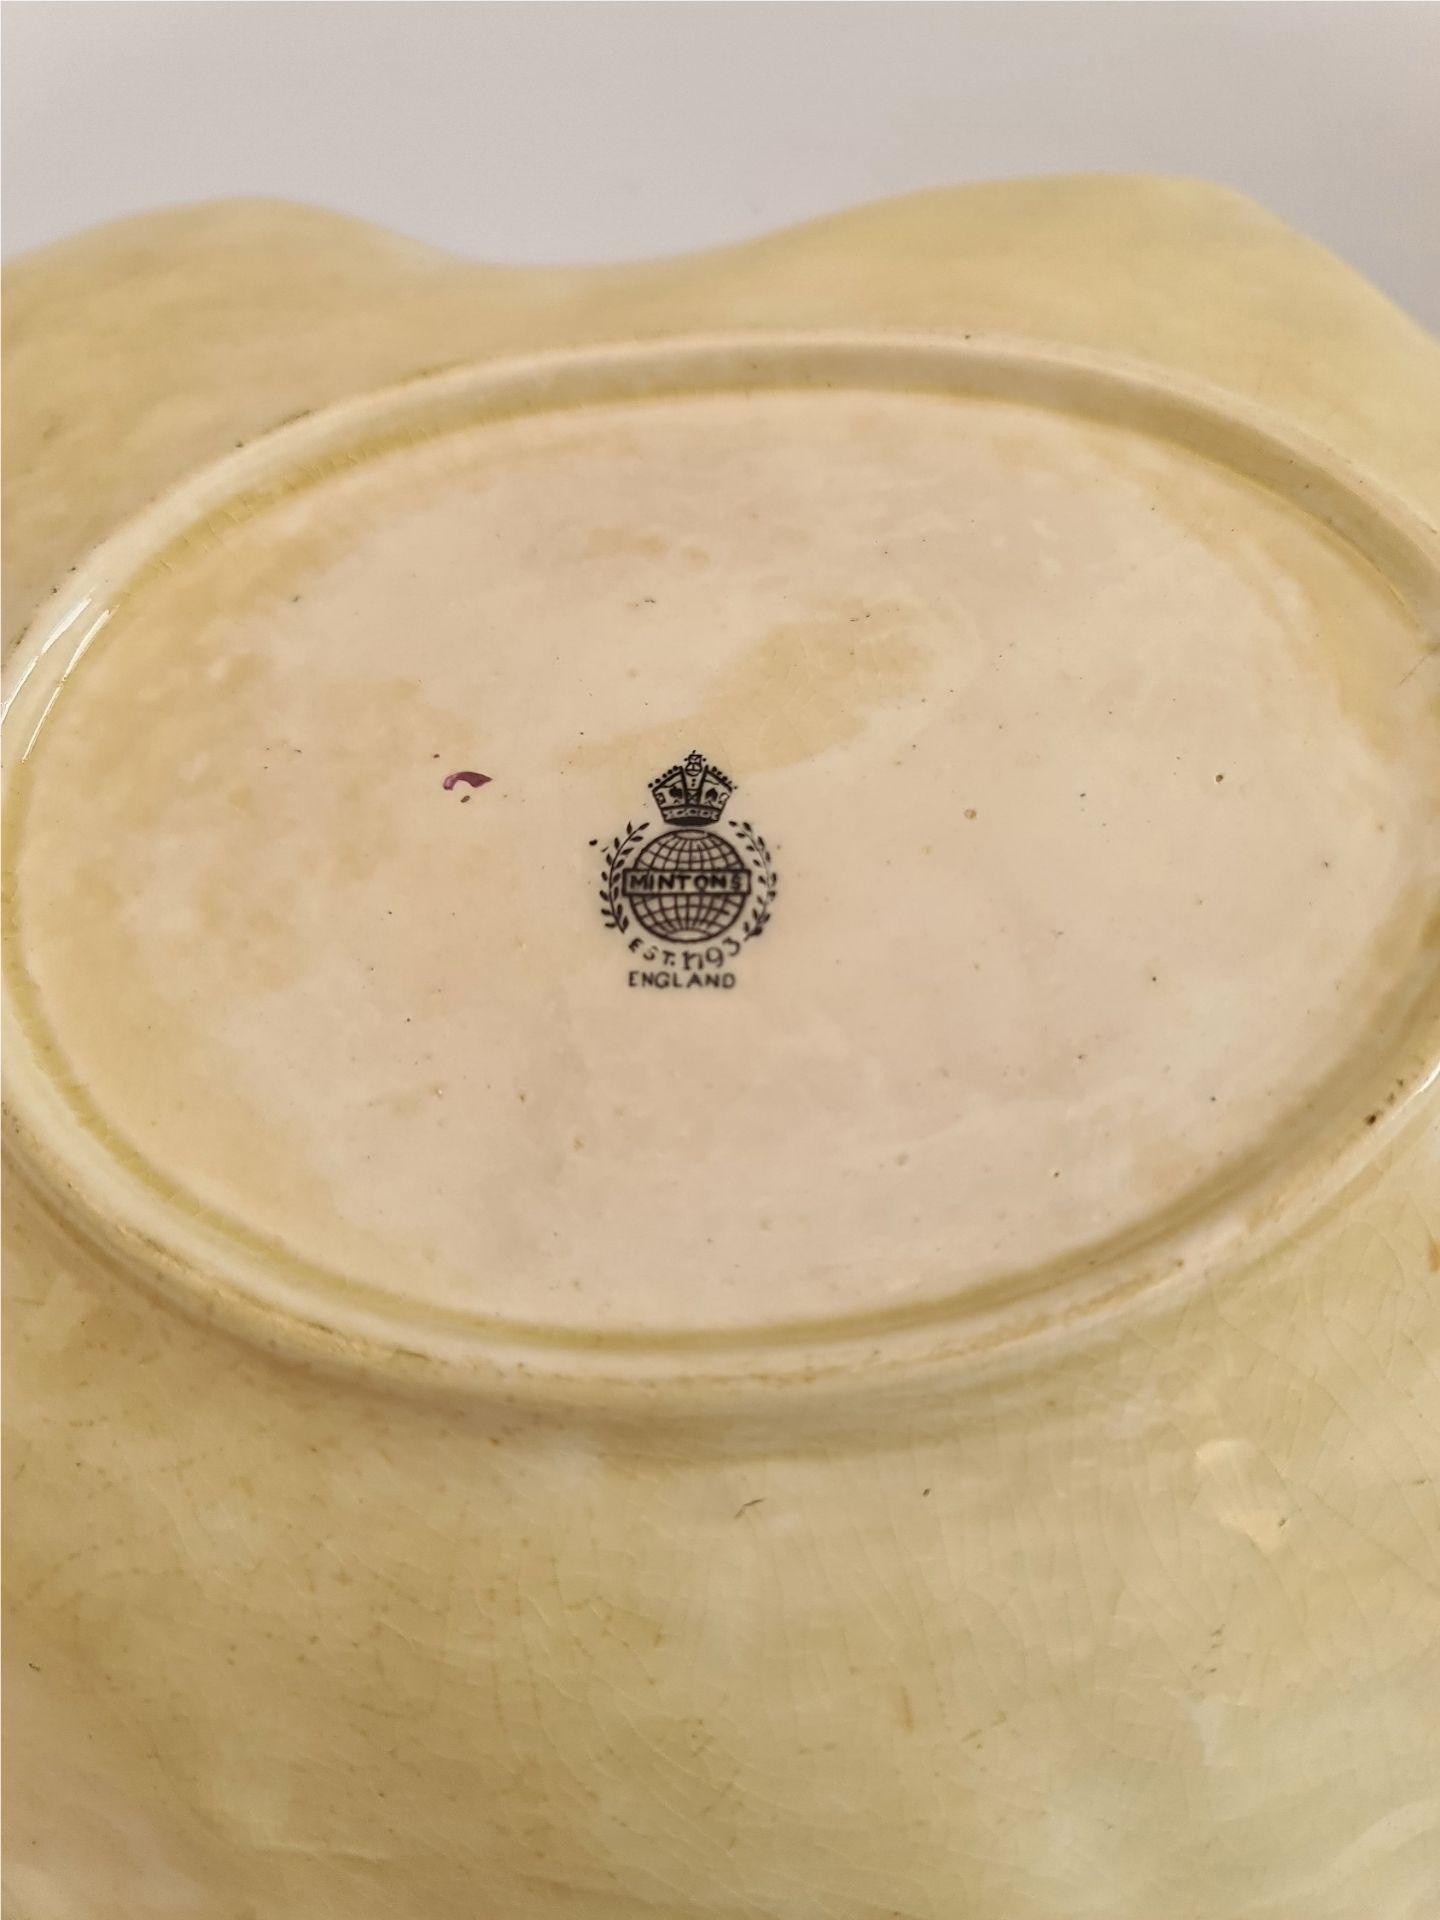 Antique Bretby Vine leaf Pottery Mailing & Minton - Image 5 of 5